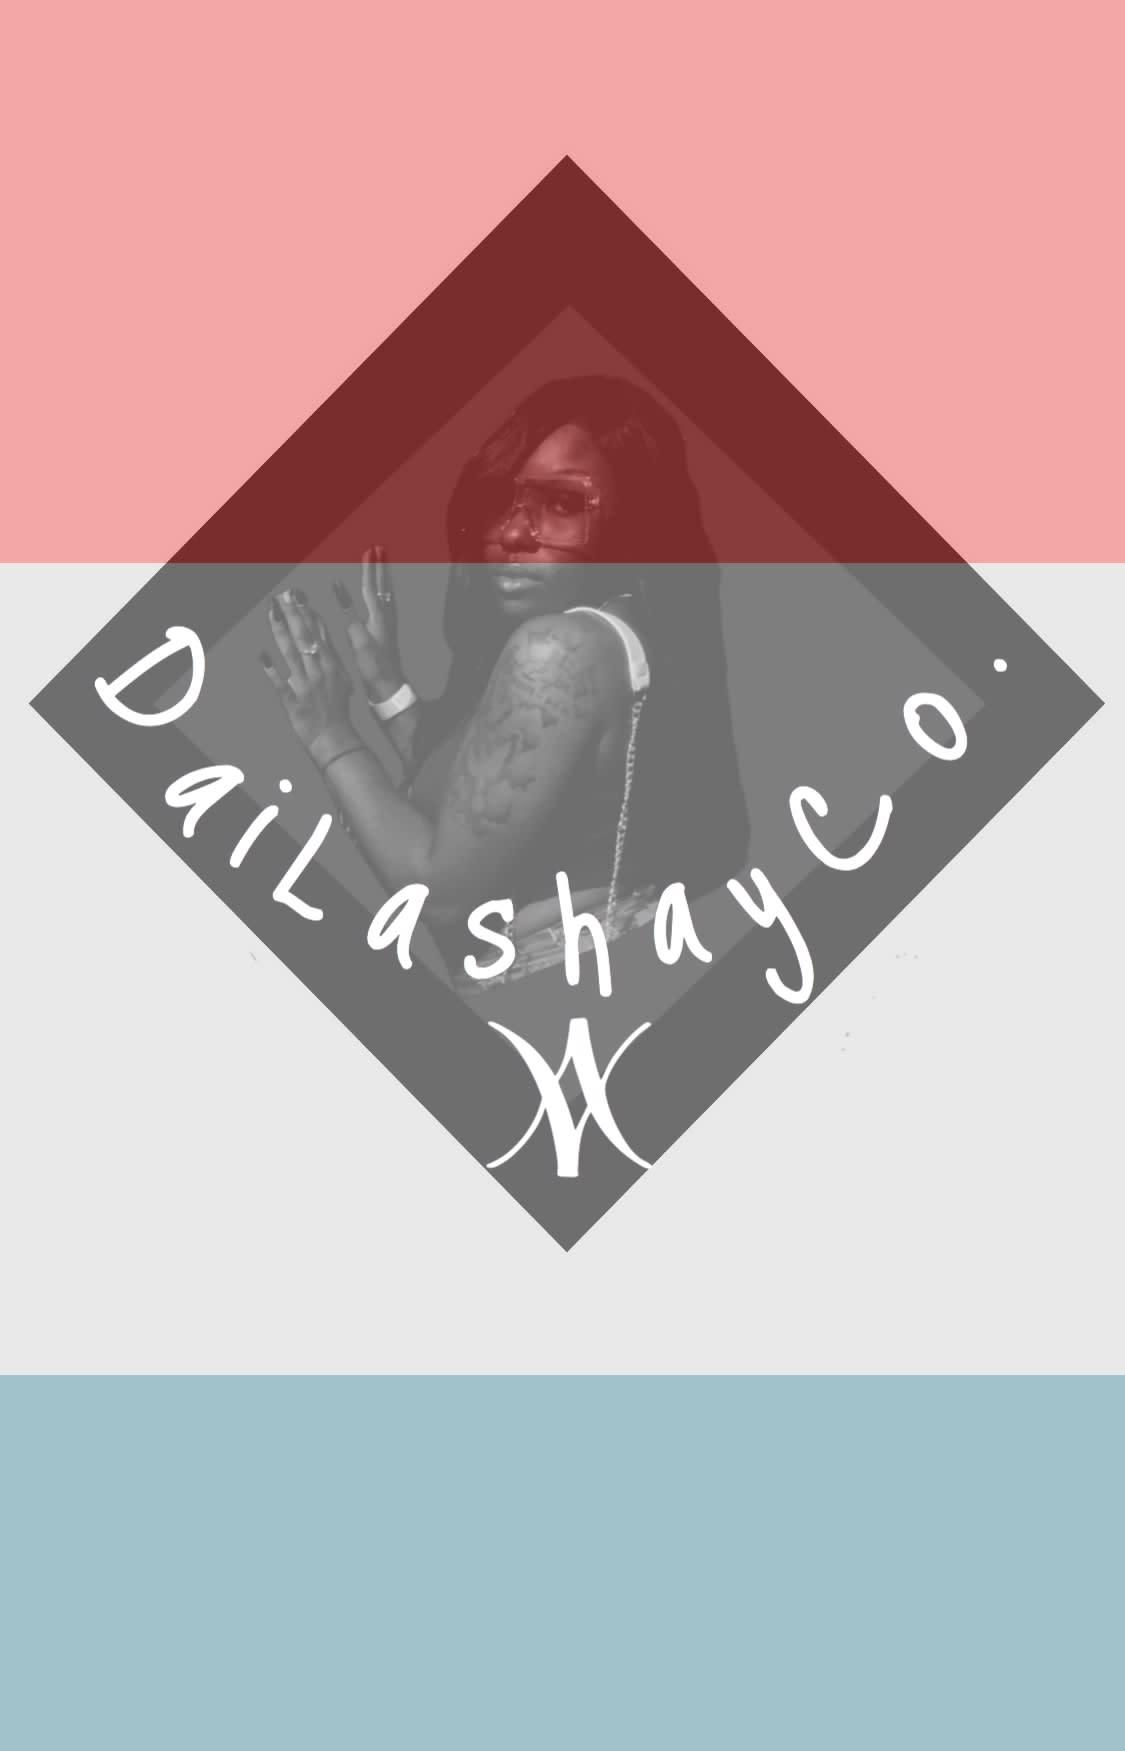 DaiLashayCo.